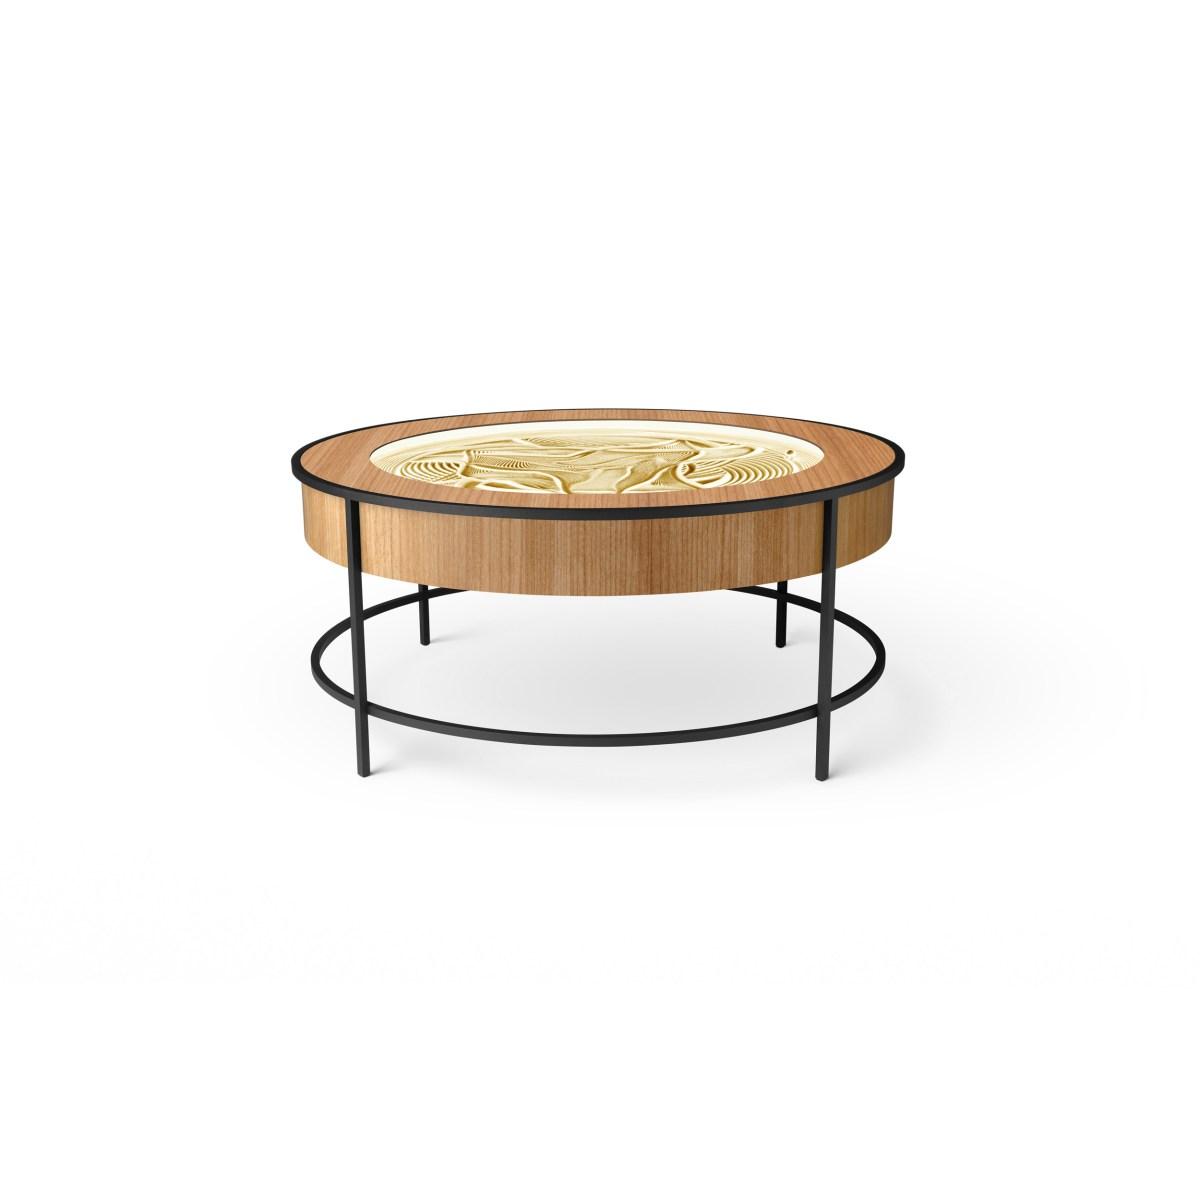 Full-Metal_Coffee-Table_Cherry_Cherry_Tung-1